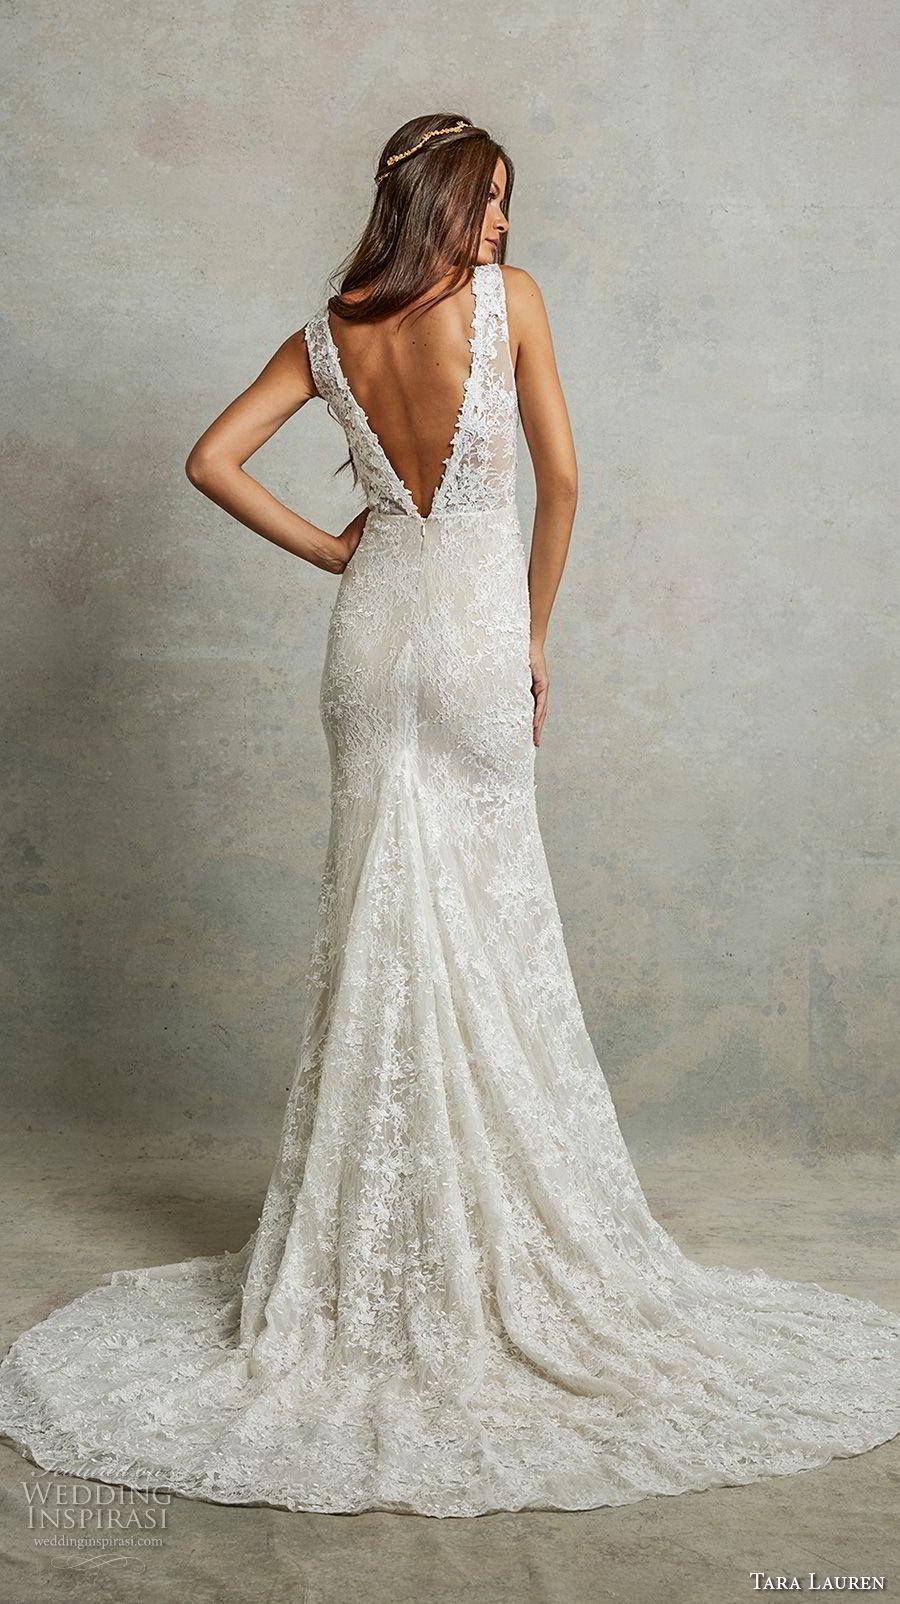 tara lauren spring 2018 bridal sleeveless deep v neck full embellishment elegant sheath wedding dress v back medium train (6) bv